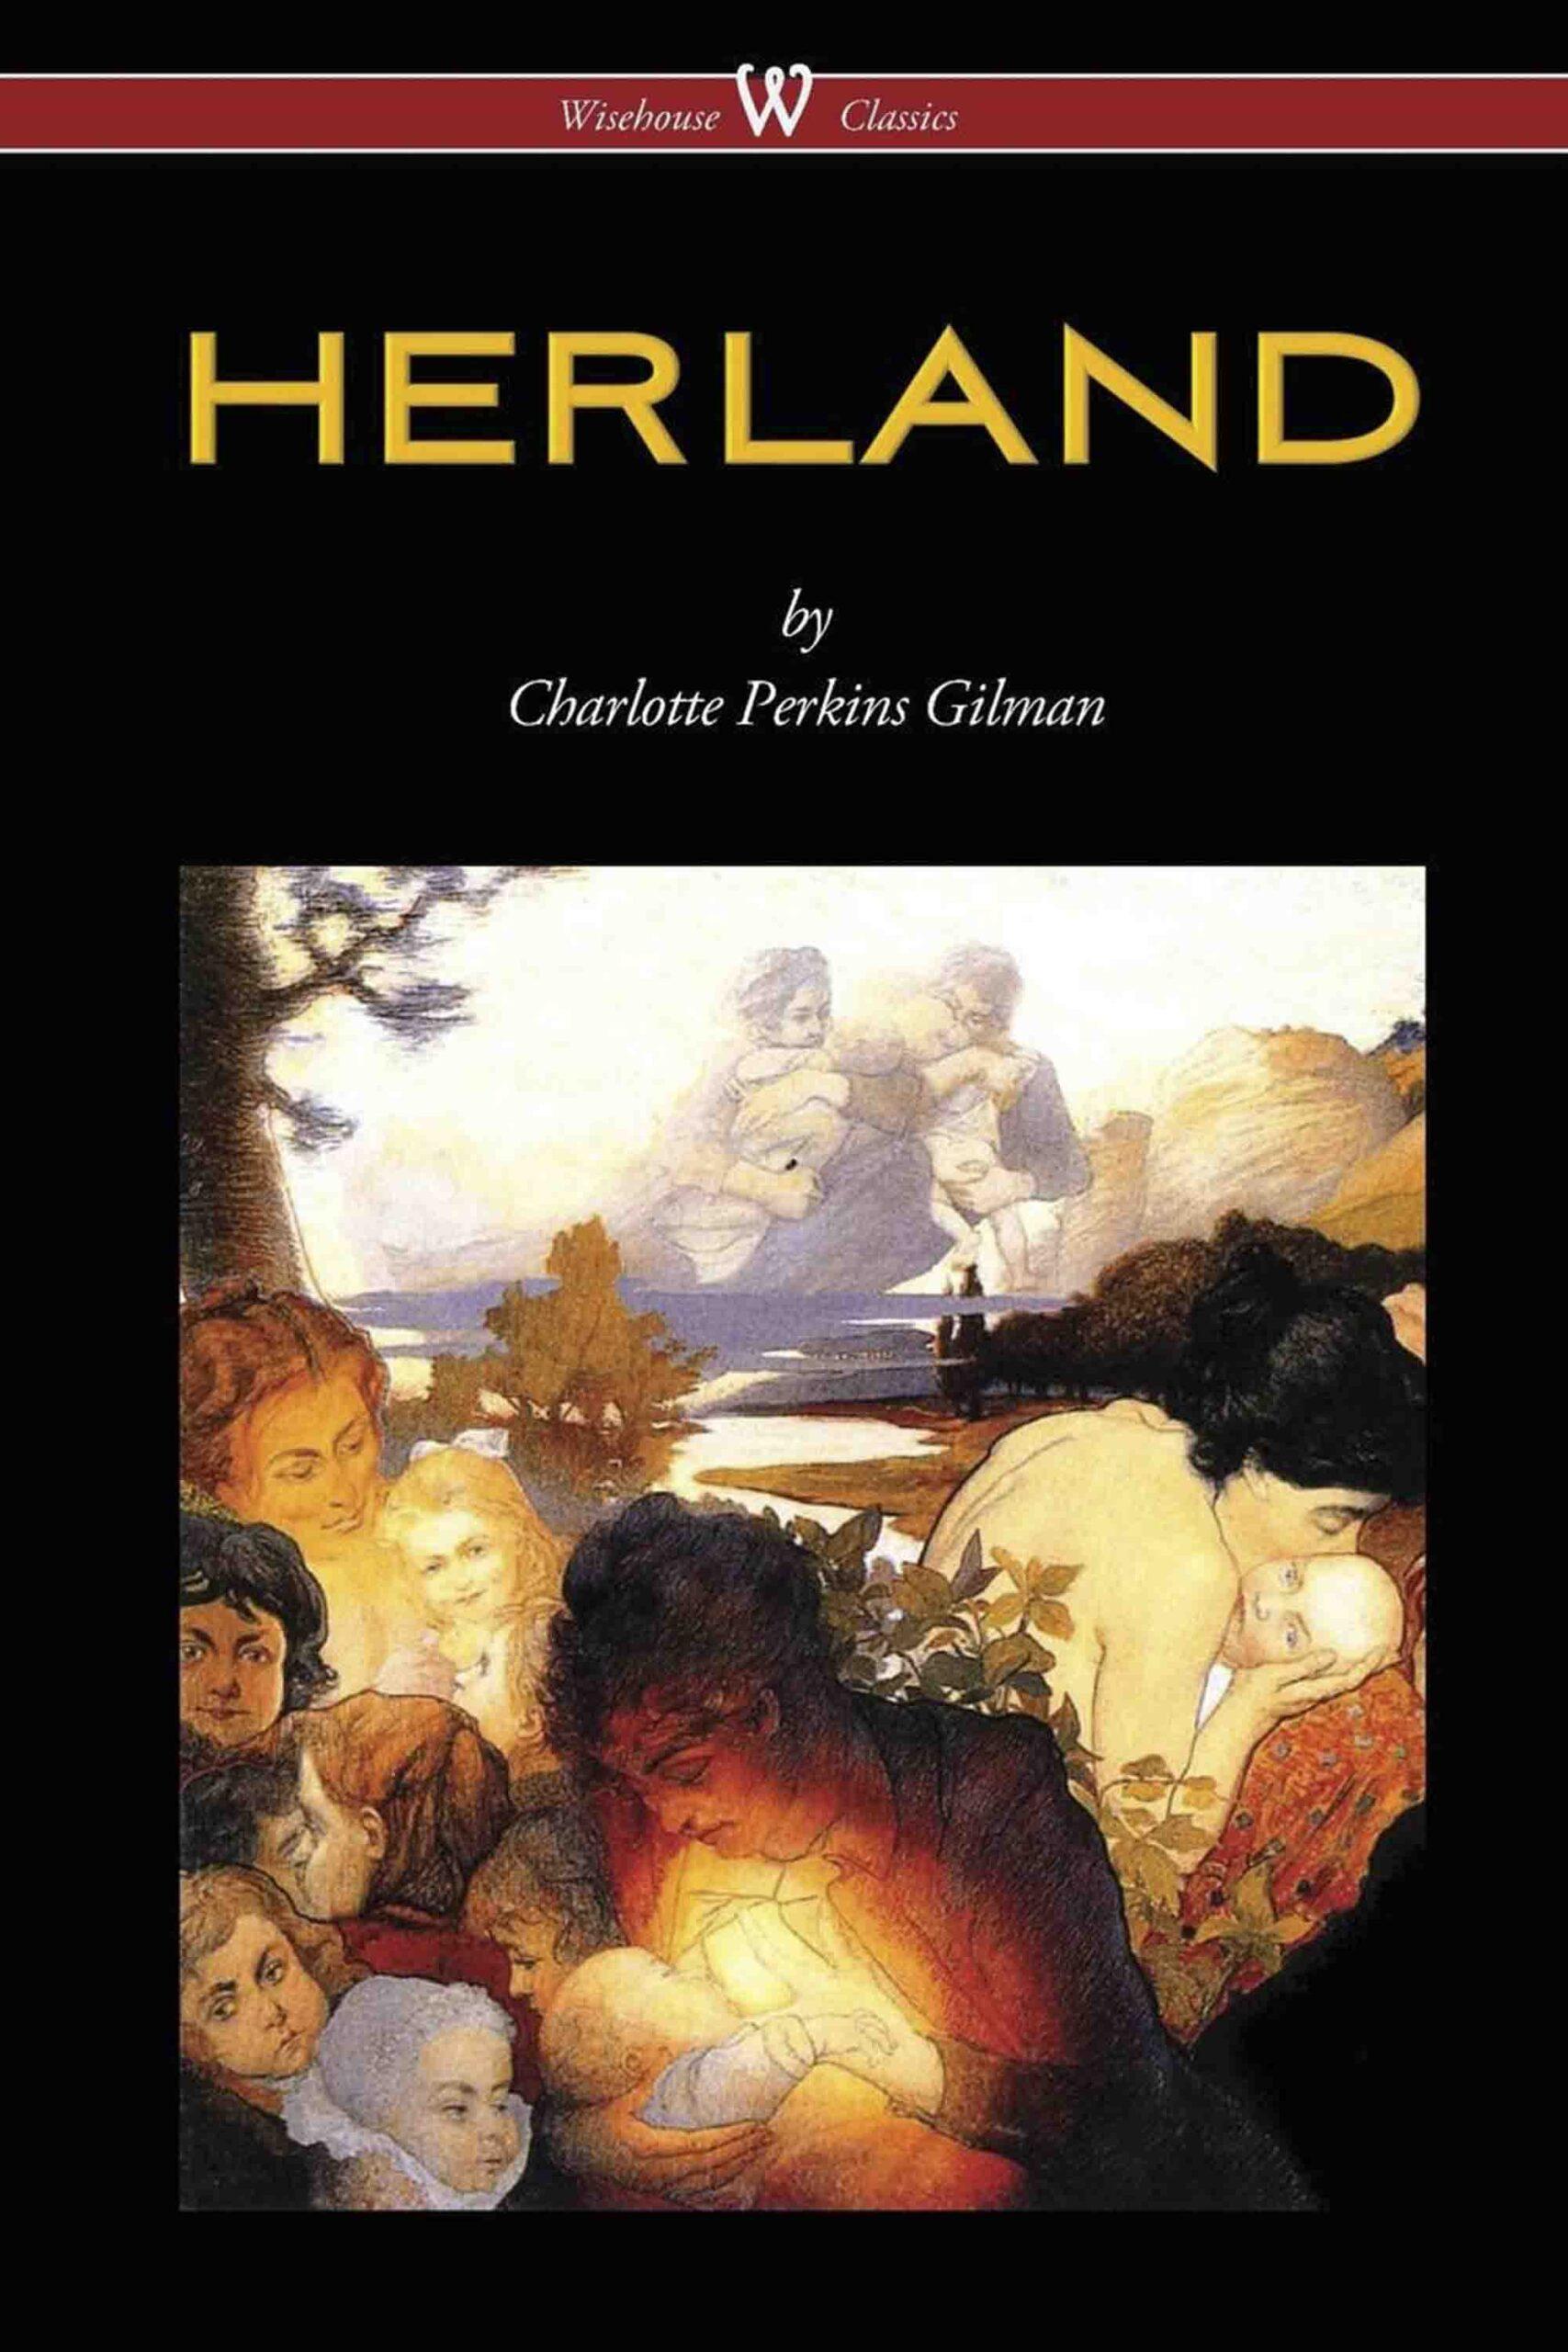 HERLAND (Wisehouse Classics – Original Edition 1909-1916)